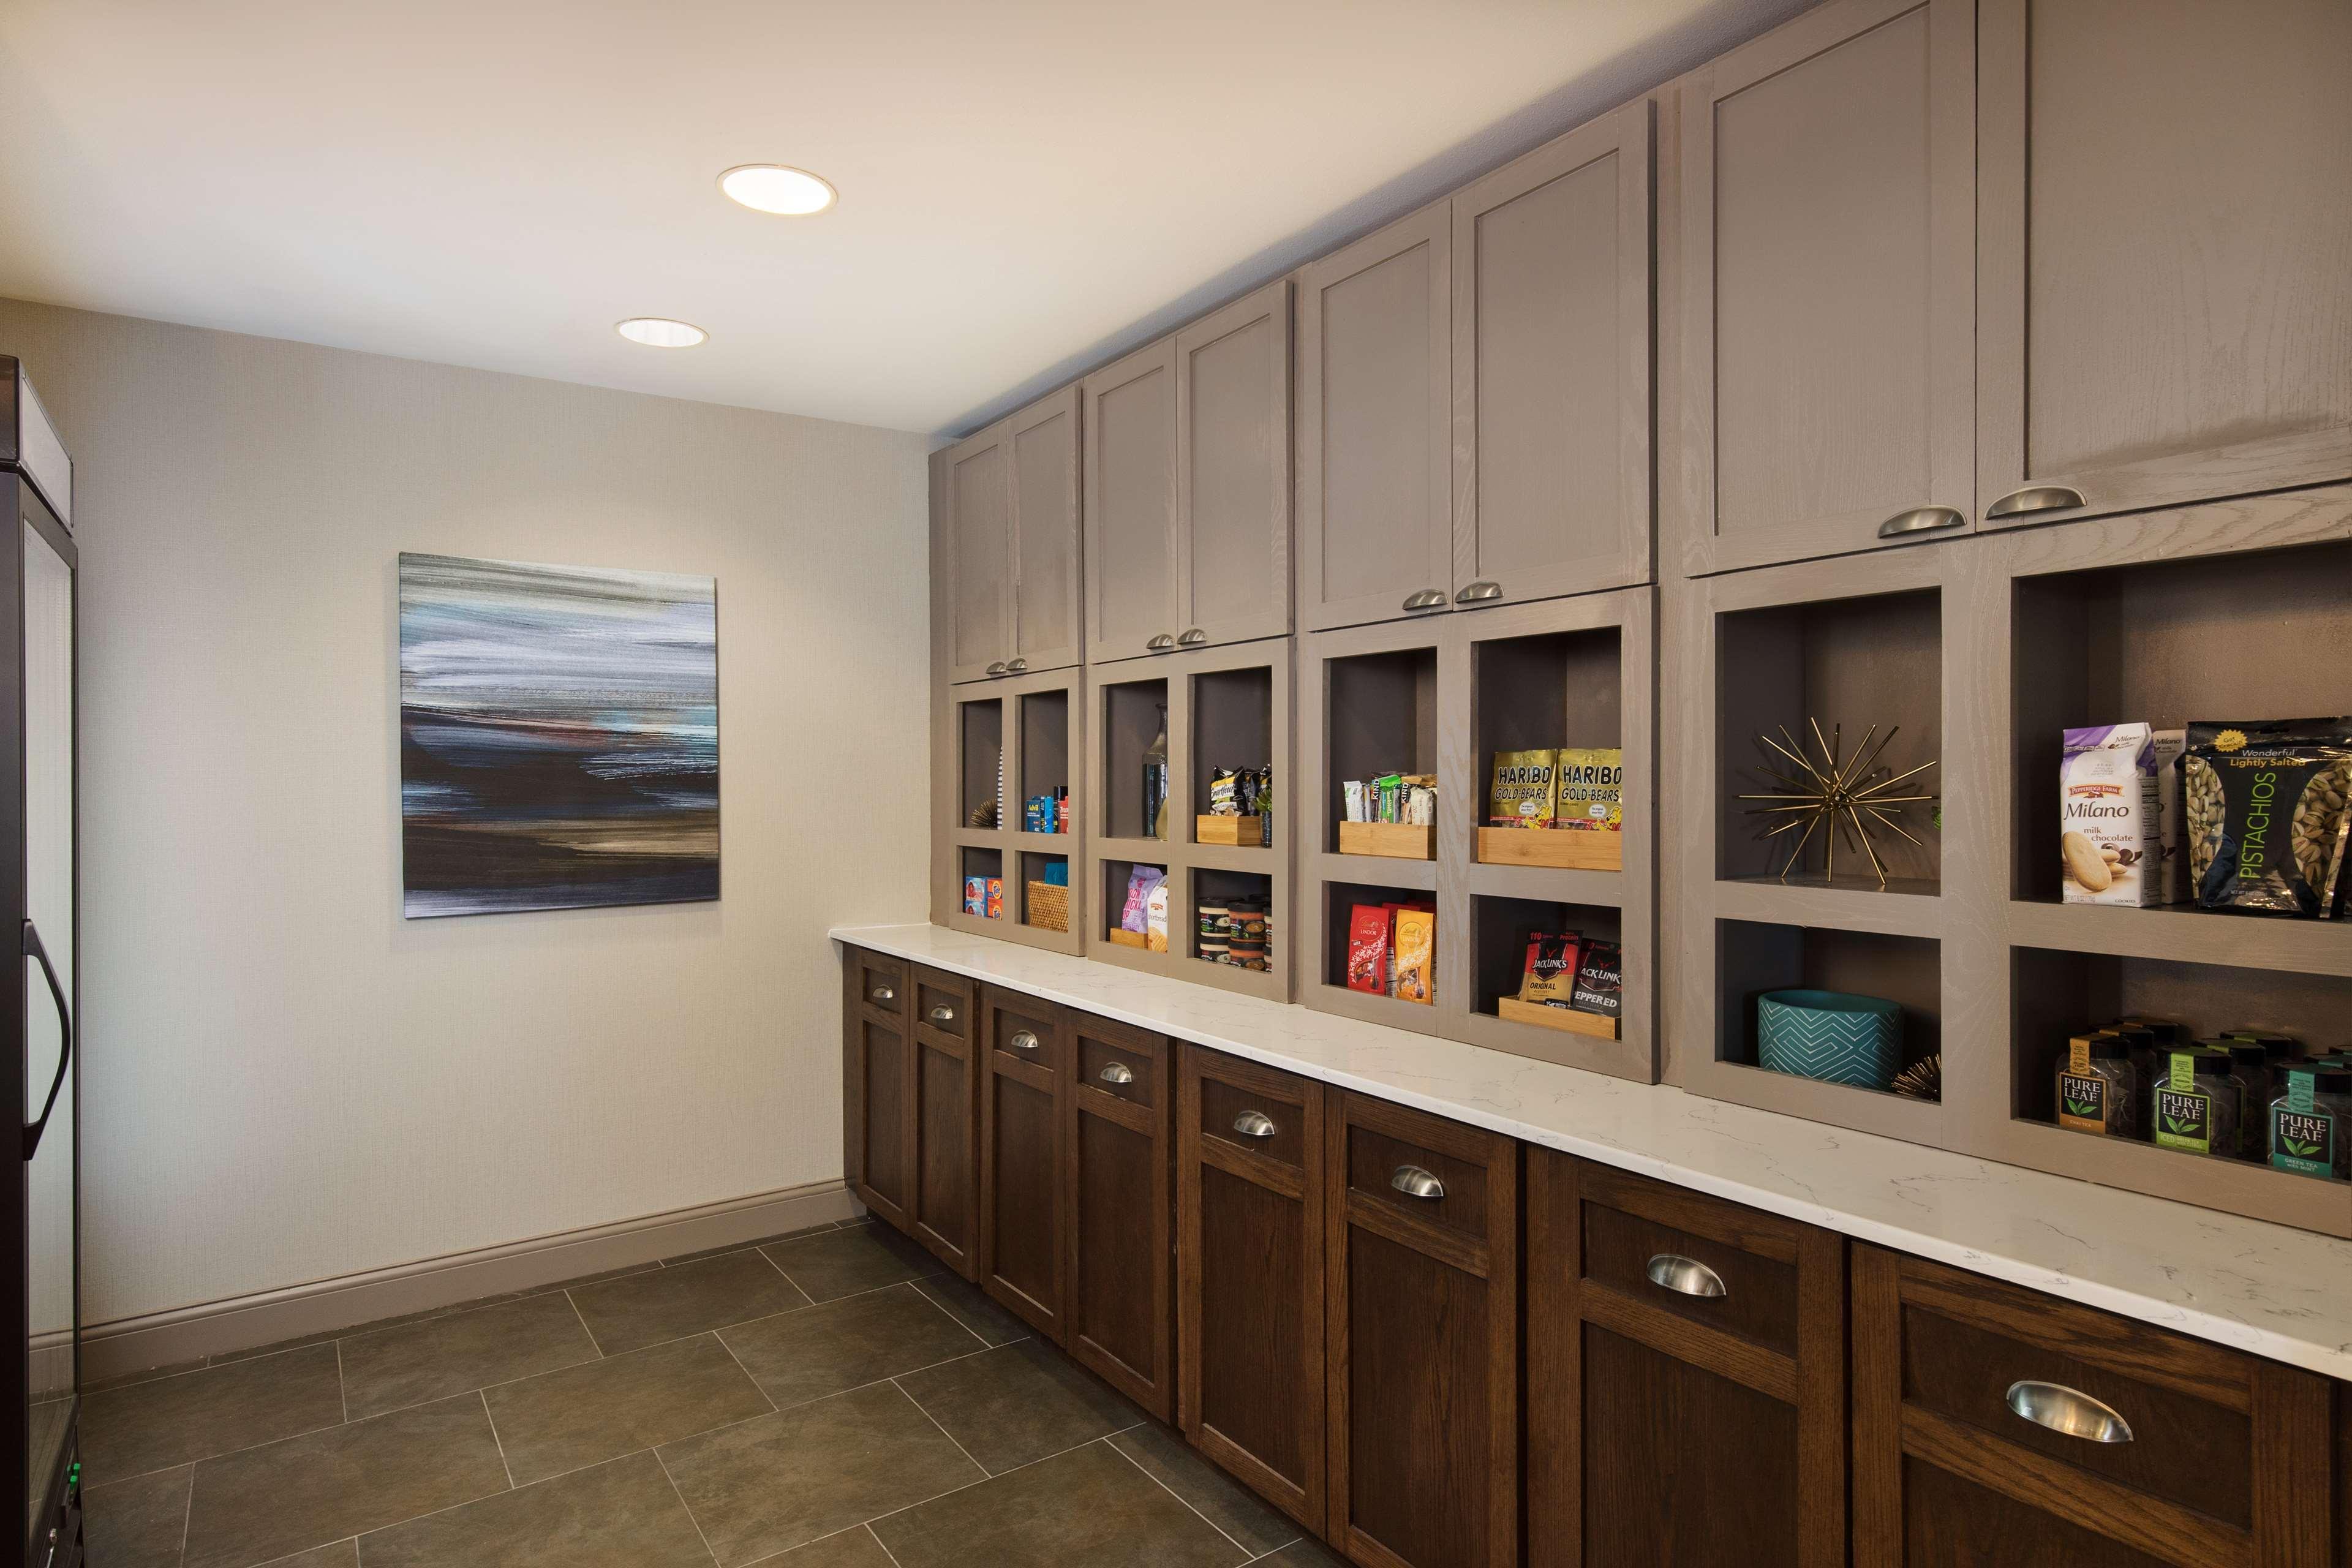 Homewood Suites by Hilton Lubbock image 10